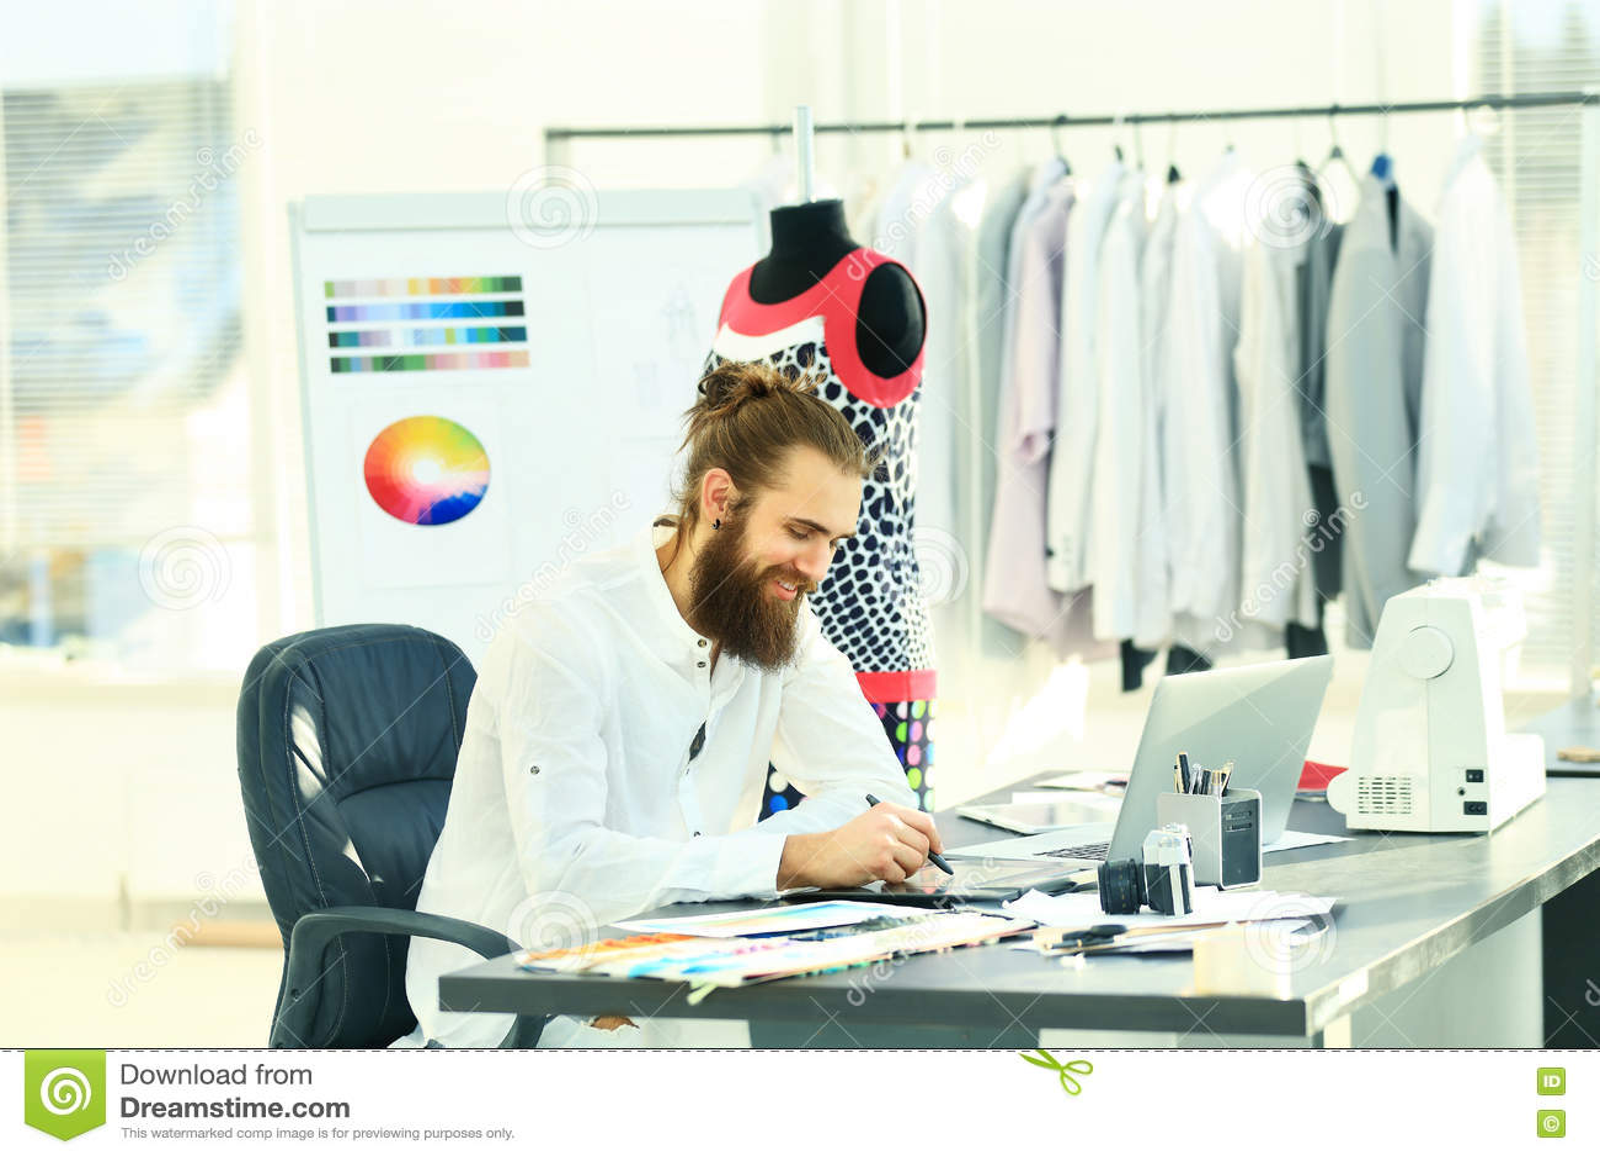 fashion designers drawings of fashion in creative Studio